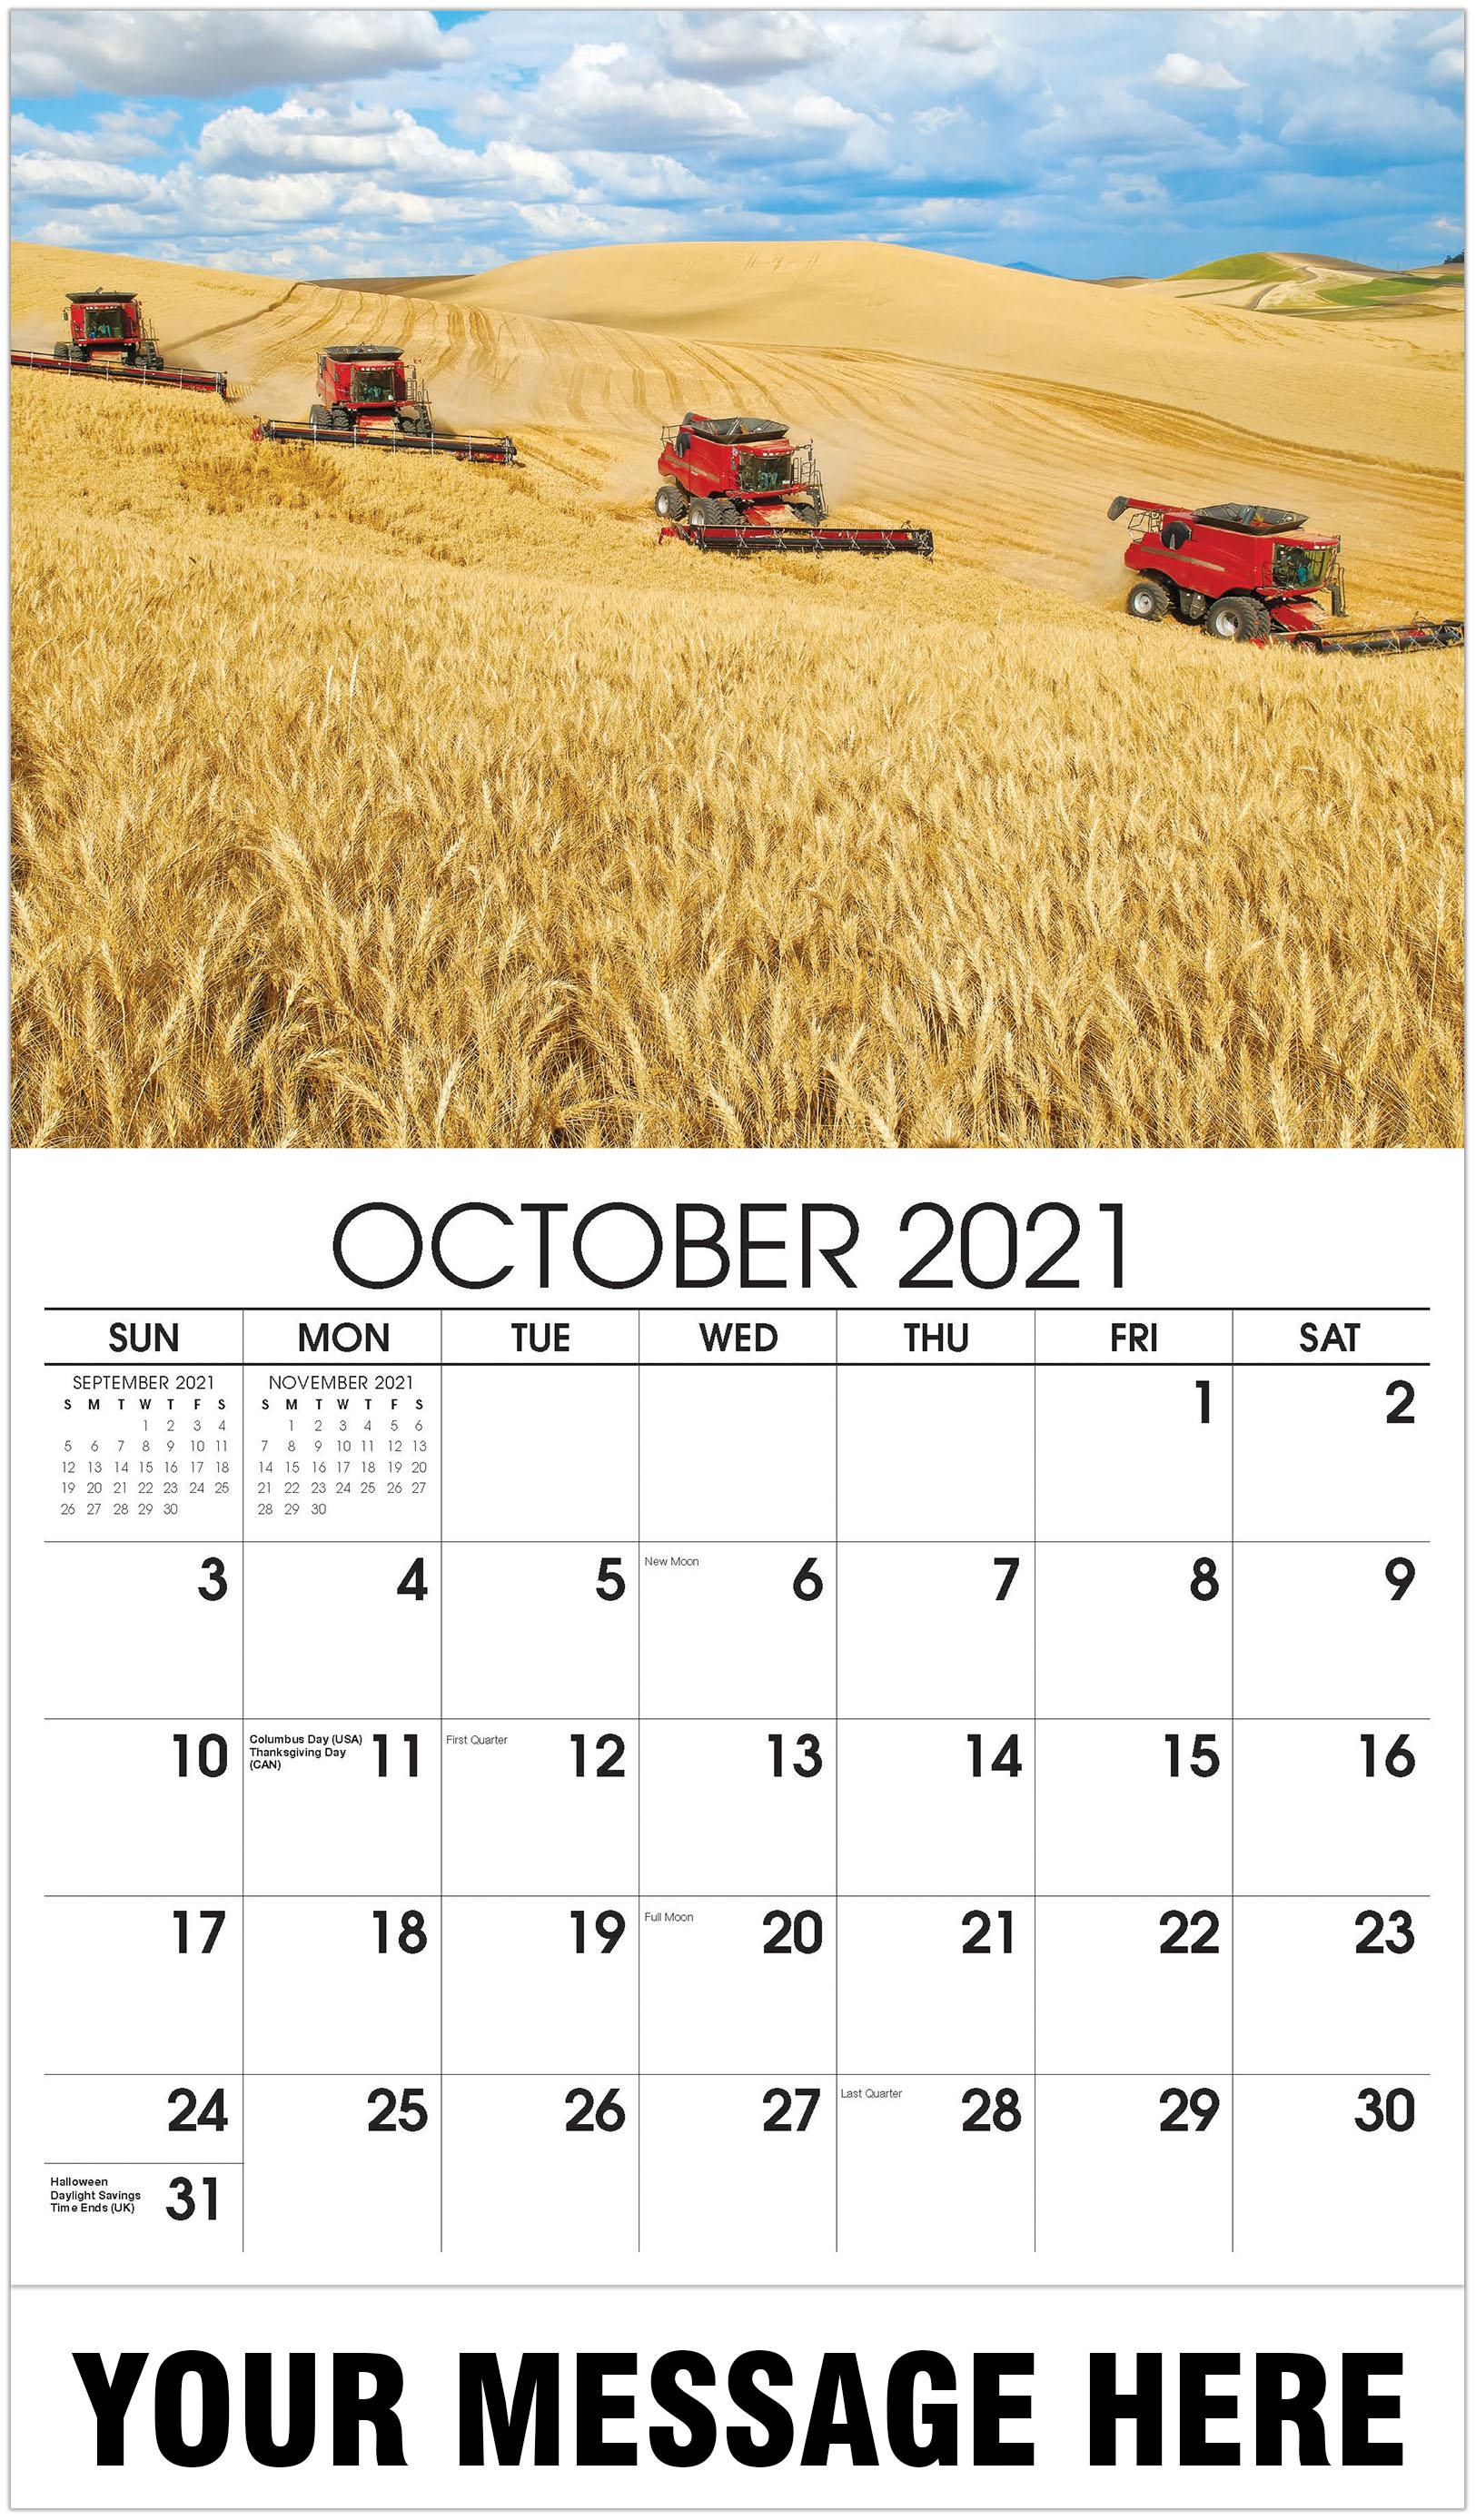 Harvest time - October - Country Spirit 2021 Promotional Calendar